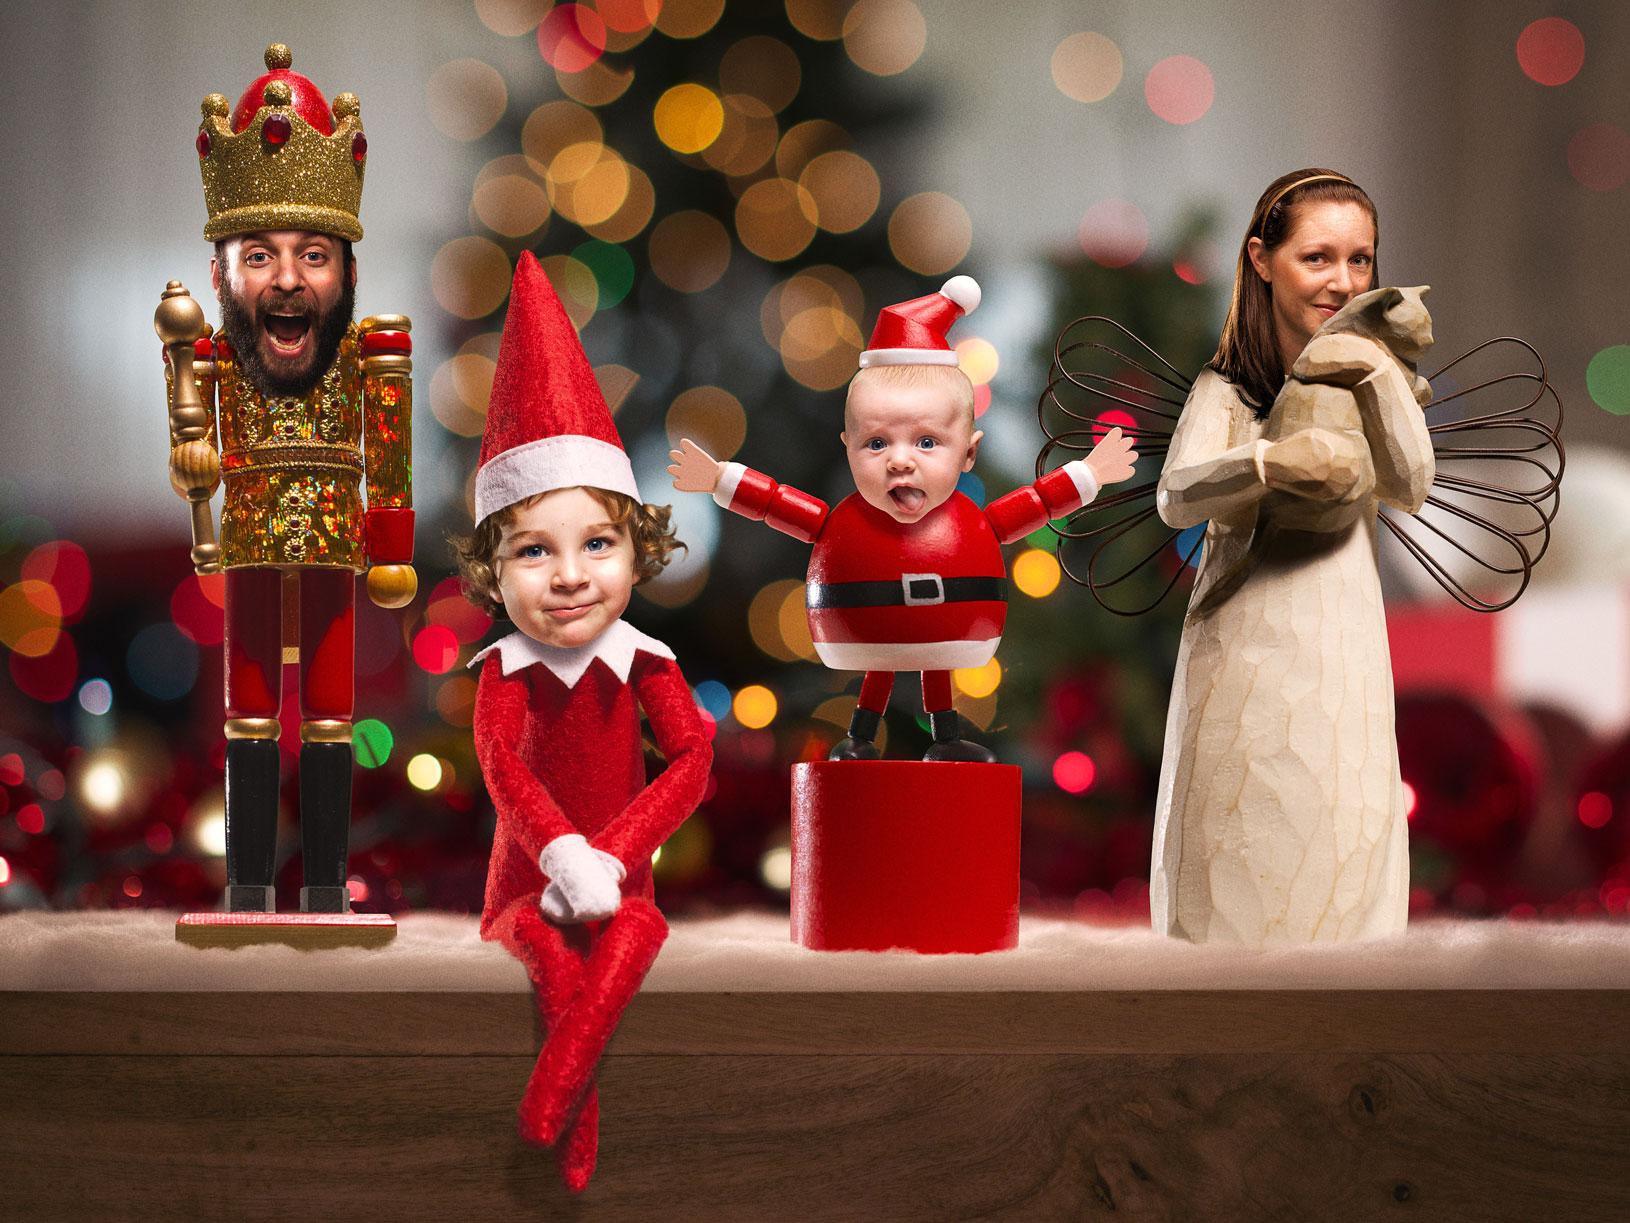 Christmas Family Photo Photofocus Photo Of The Day Christmas Family Photo